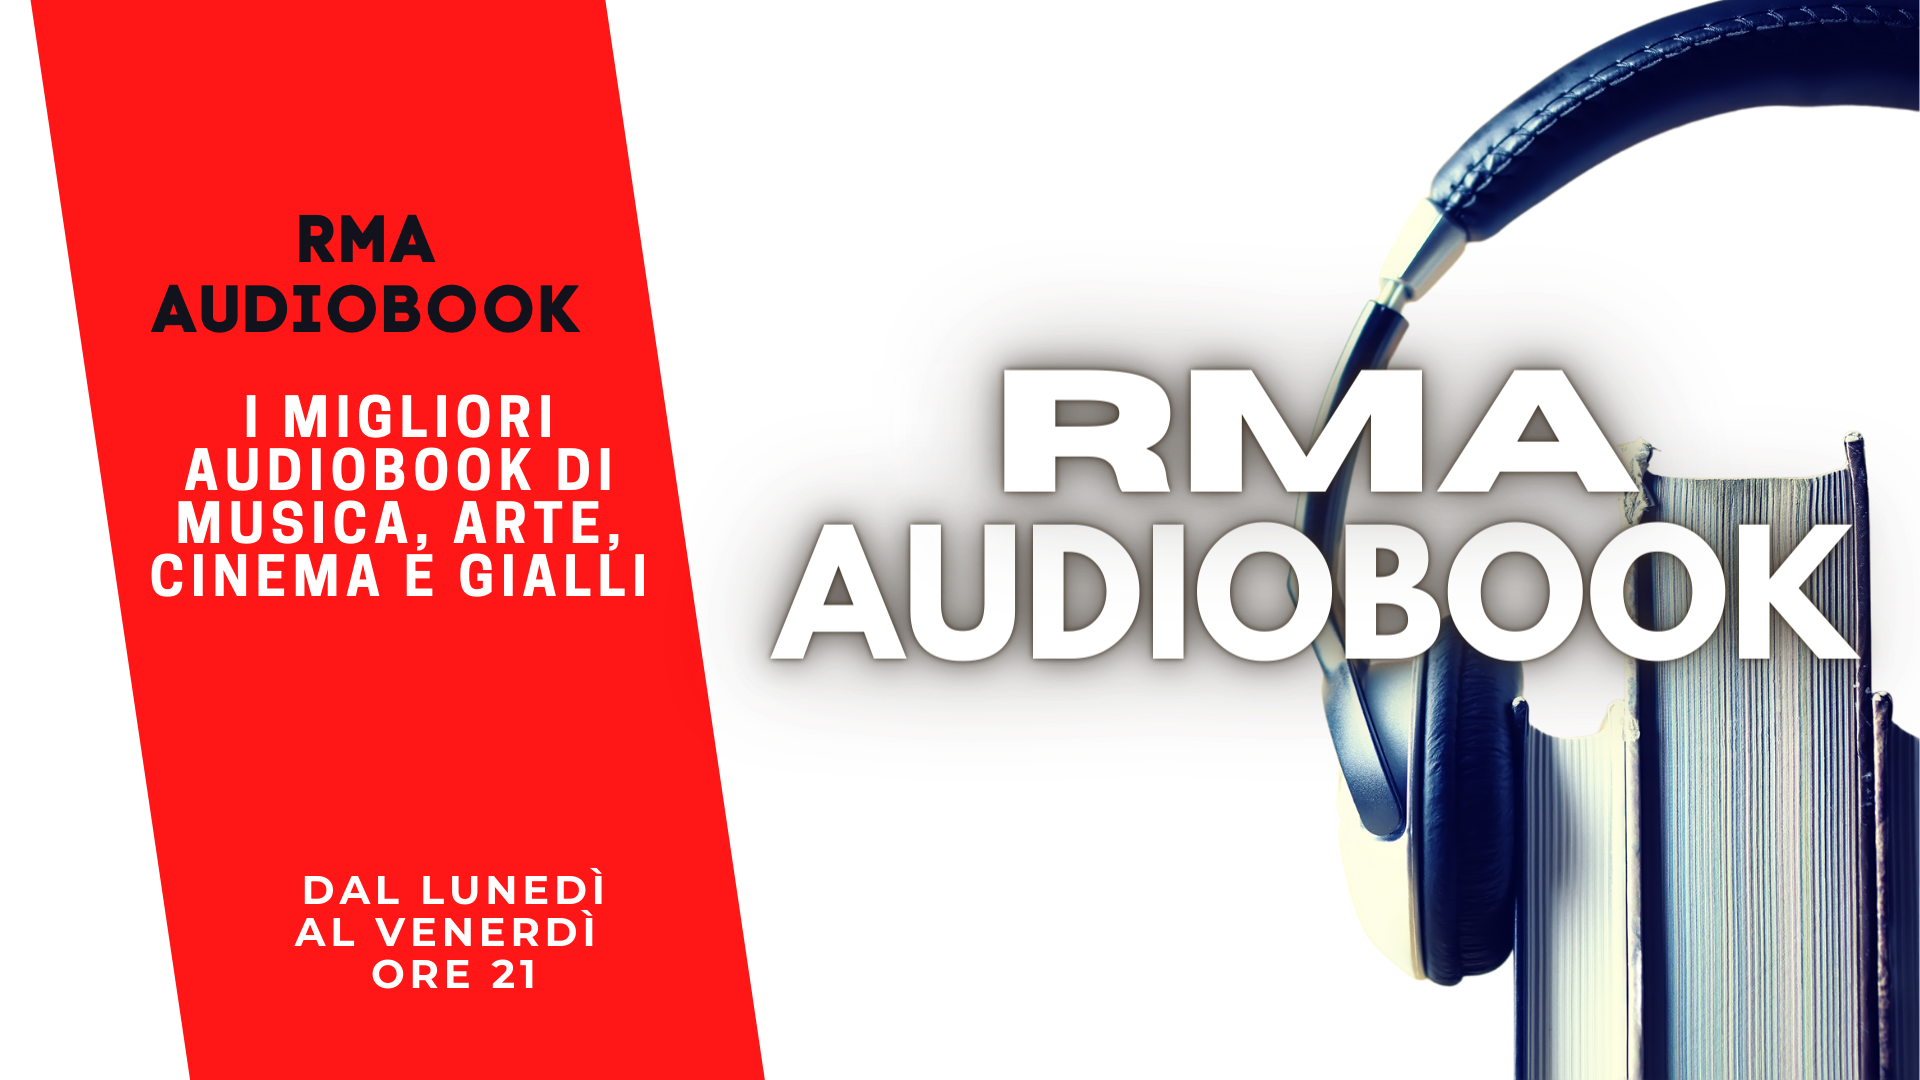 RMA AUDIOBOOK